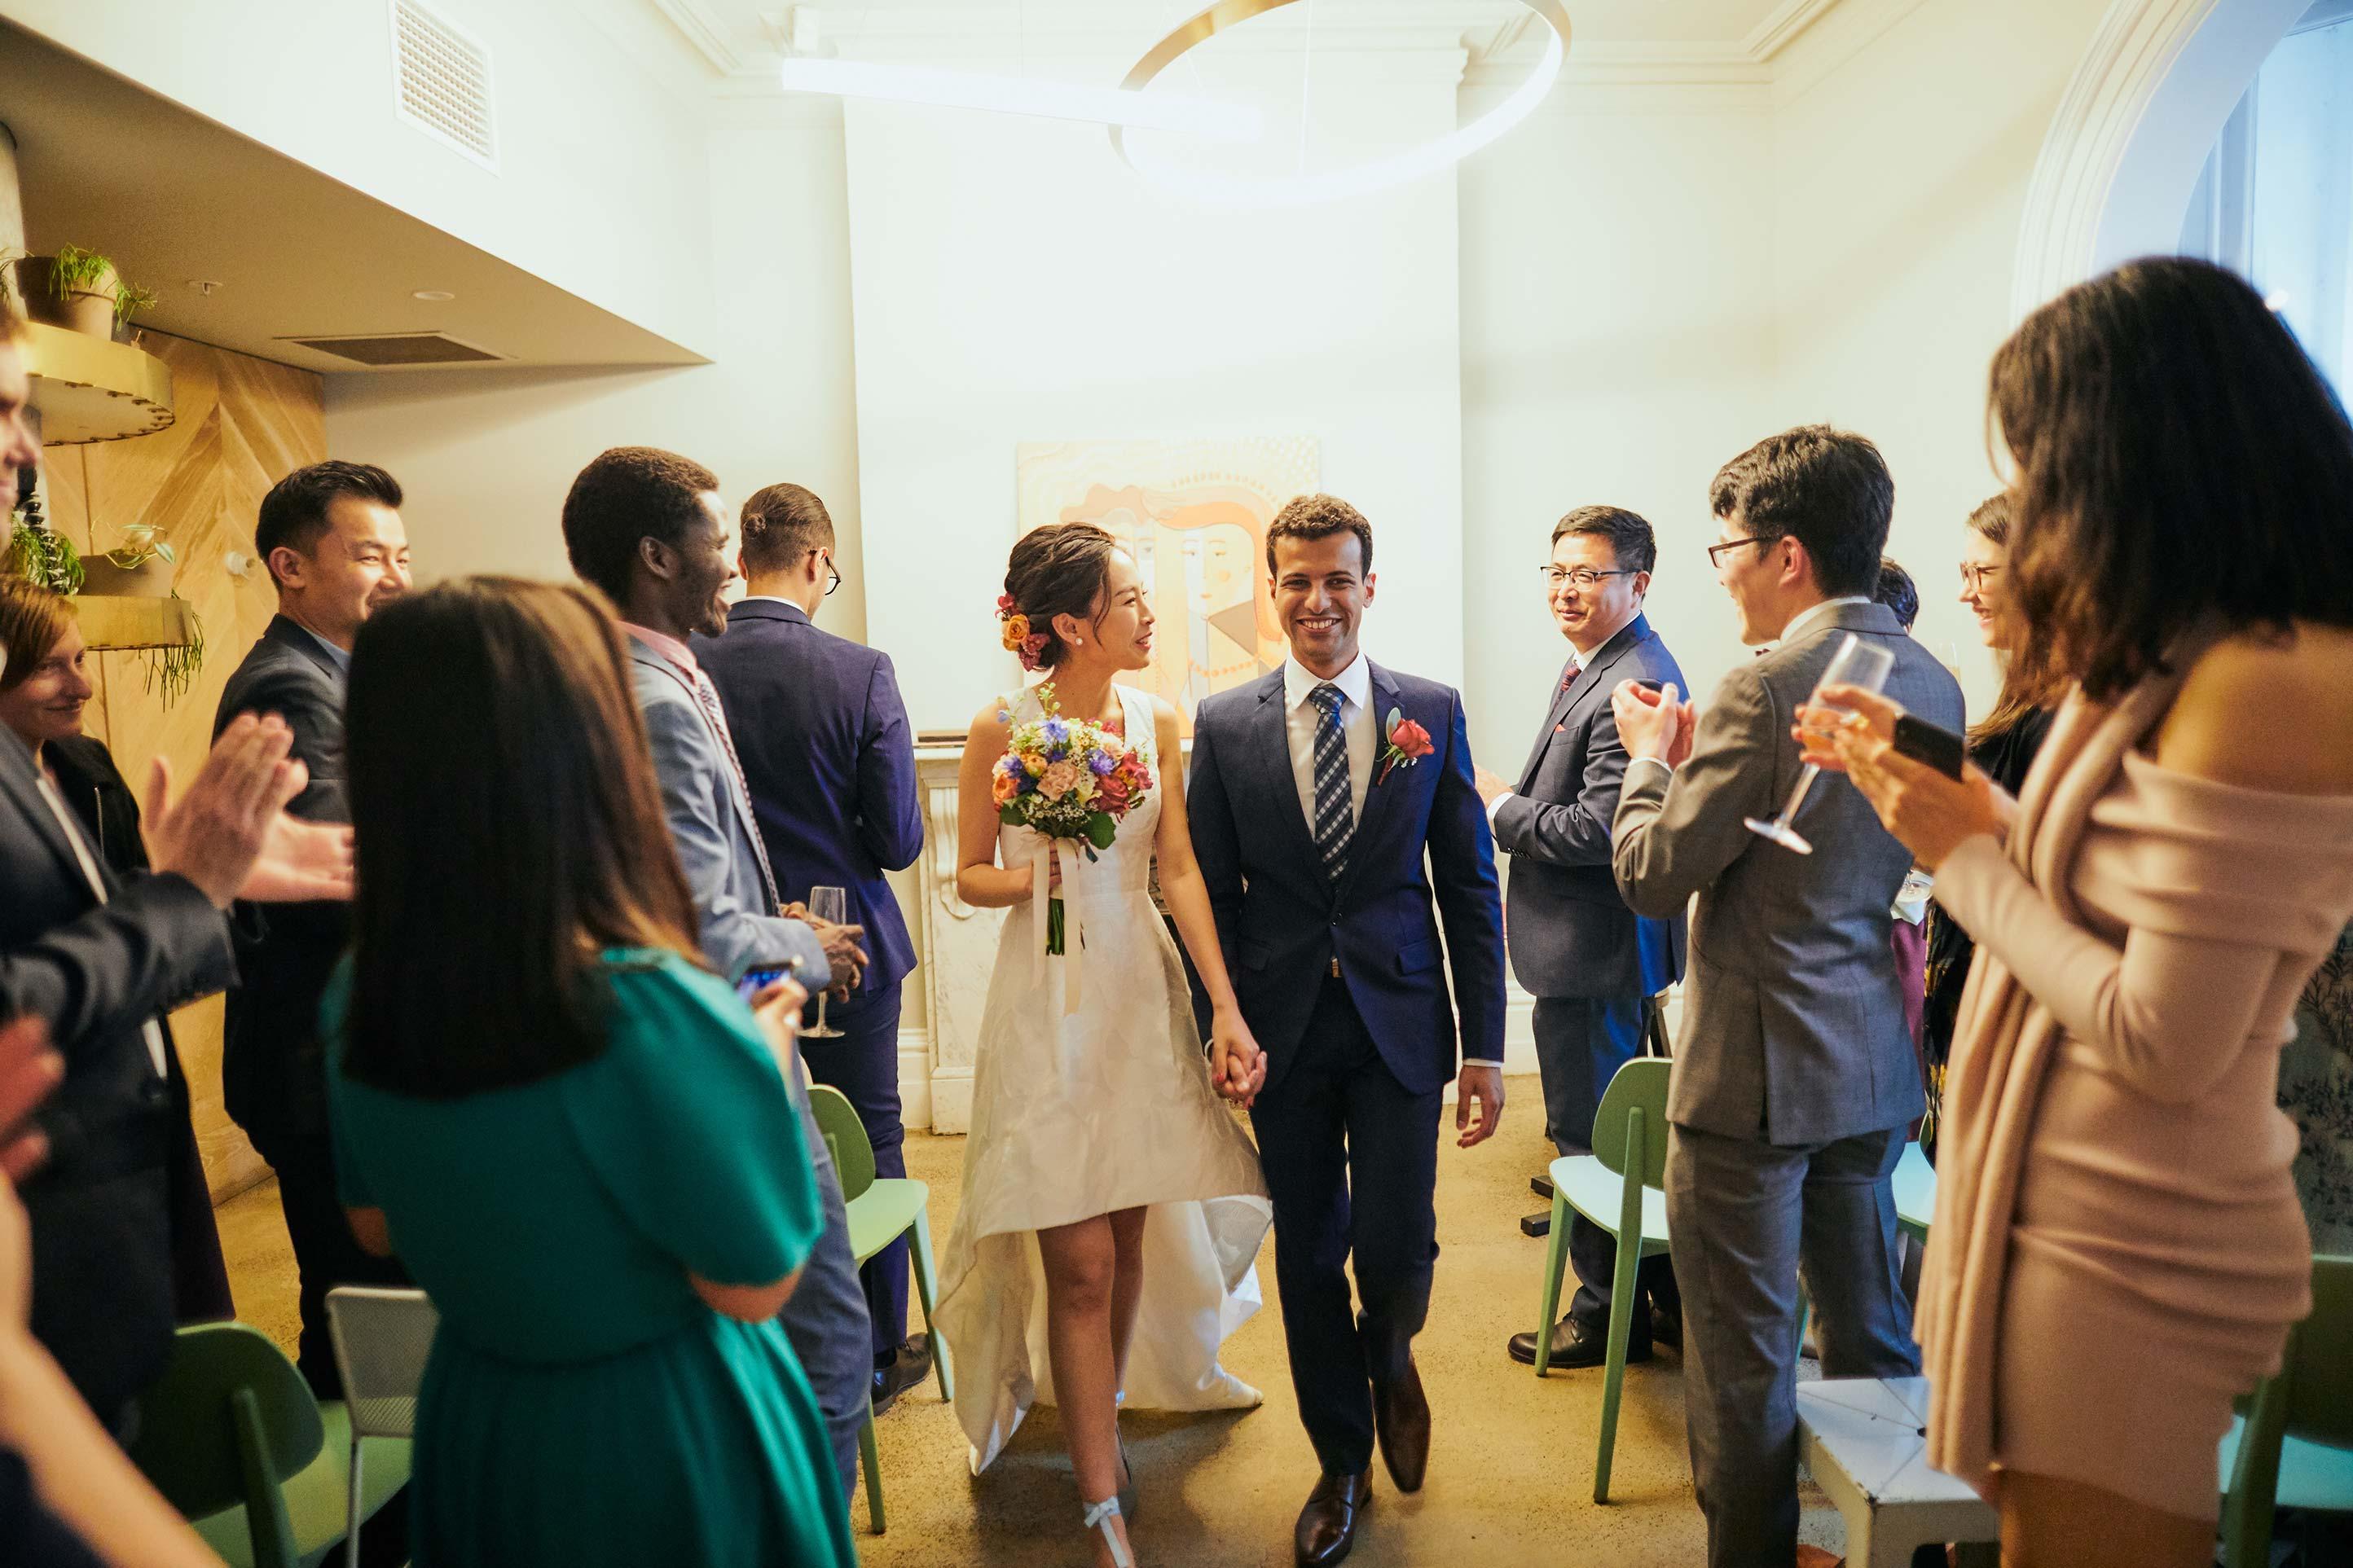 Melbourne-Wedding-Photographer-Kettle-Black-ceremony-exit